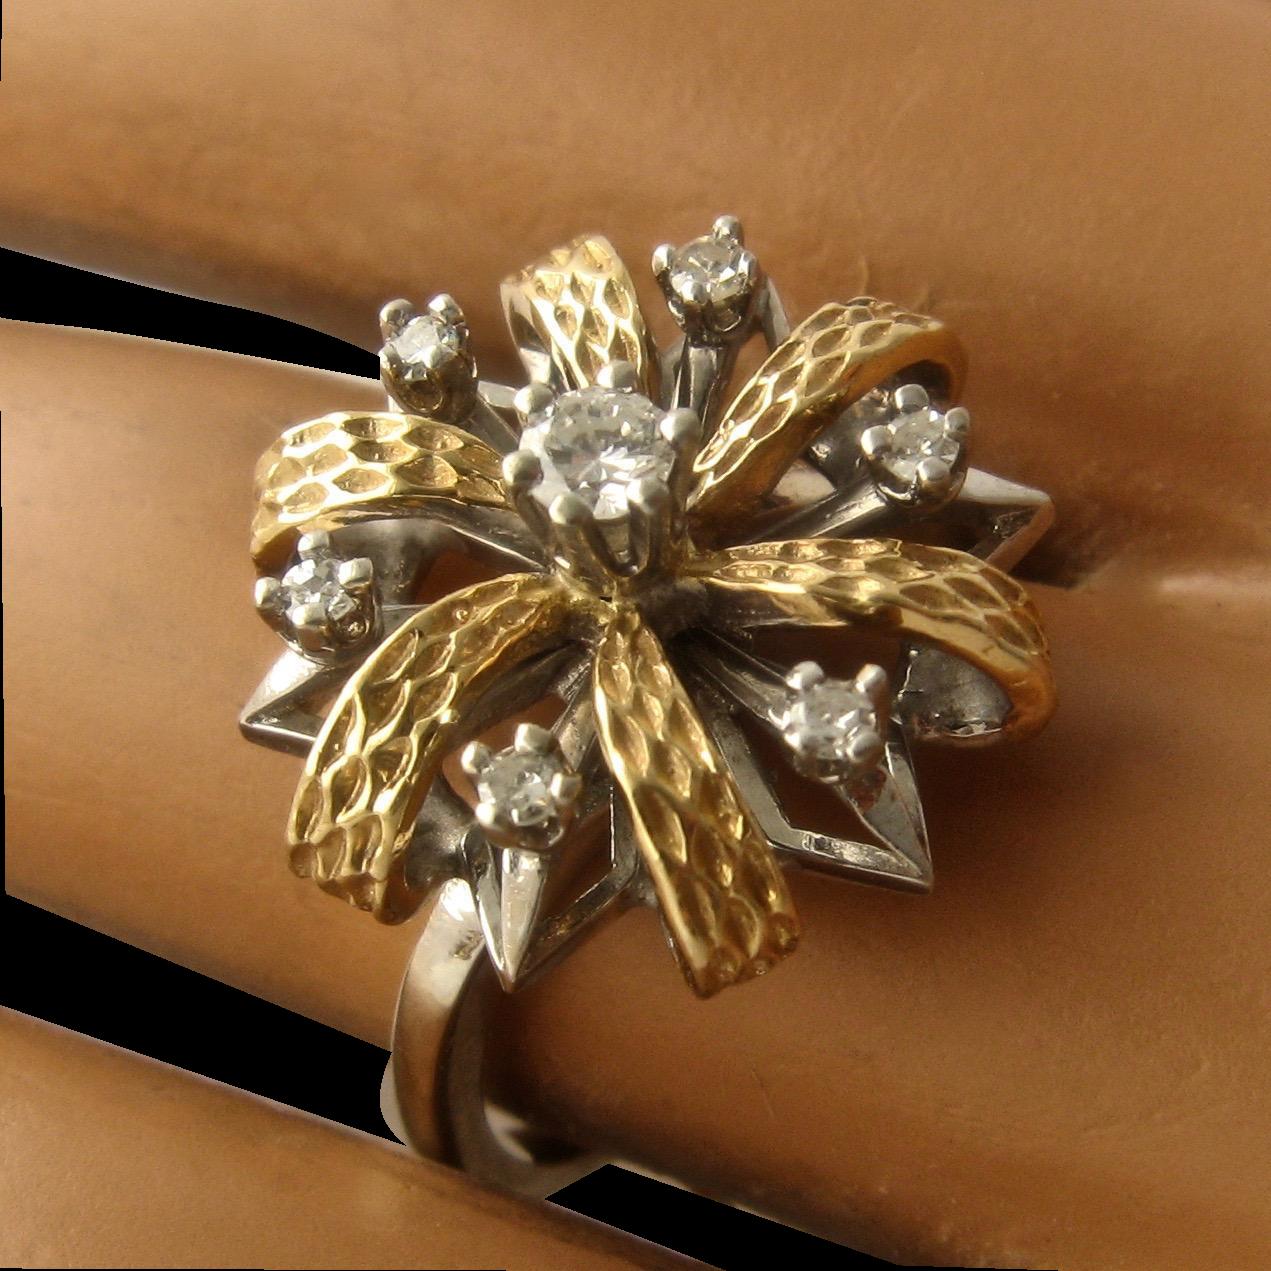 Ca 1950s 14k white yellow gold diamonds flower ring by famor sz 8 ca 1950s 14k white yellow gold diamonds flower ring by famor sz 8 mendocino vintage ruby lane mightylinksfo